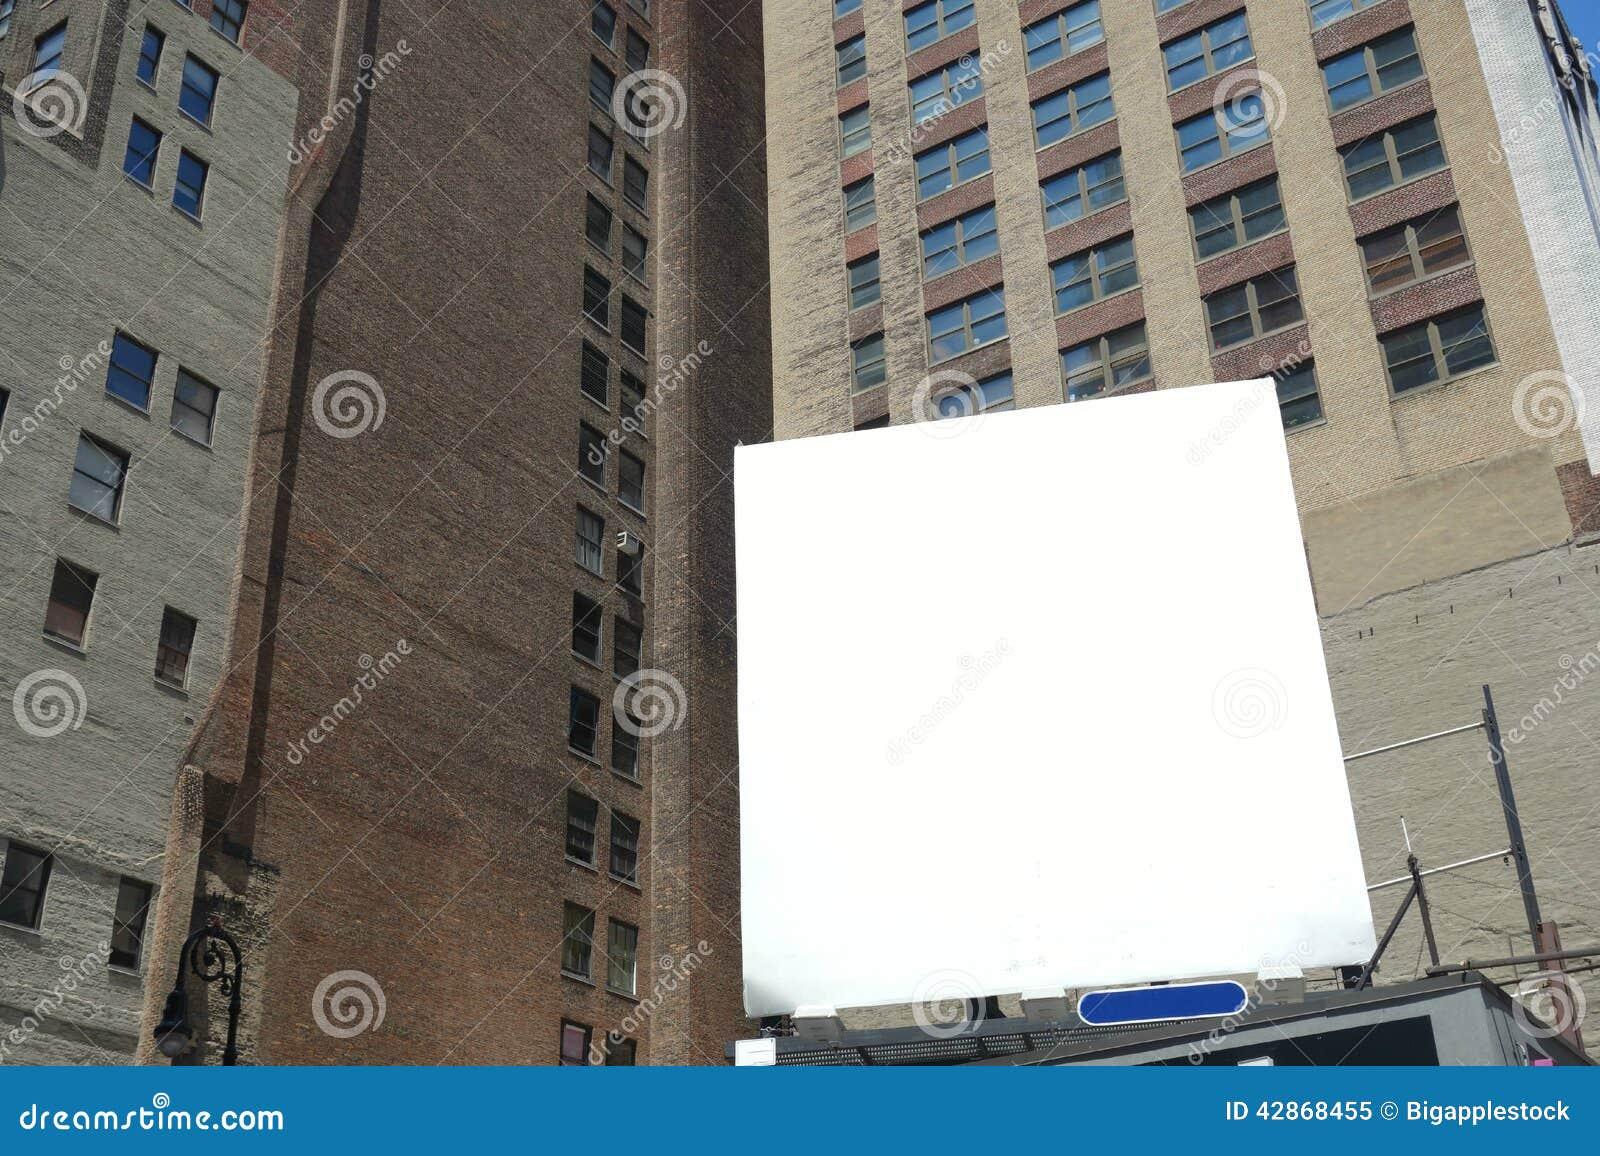 Blank Urban Billboard Stock Photo - Image: 42868455